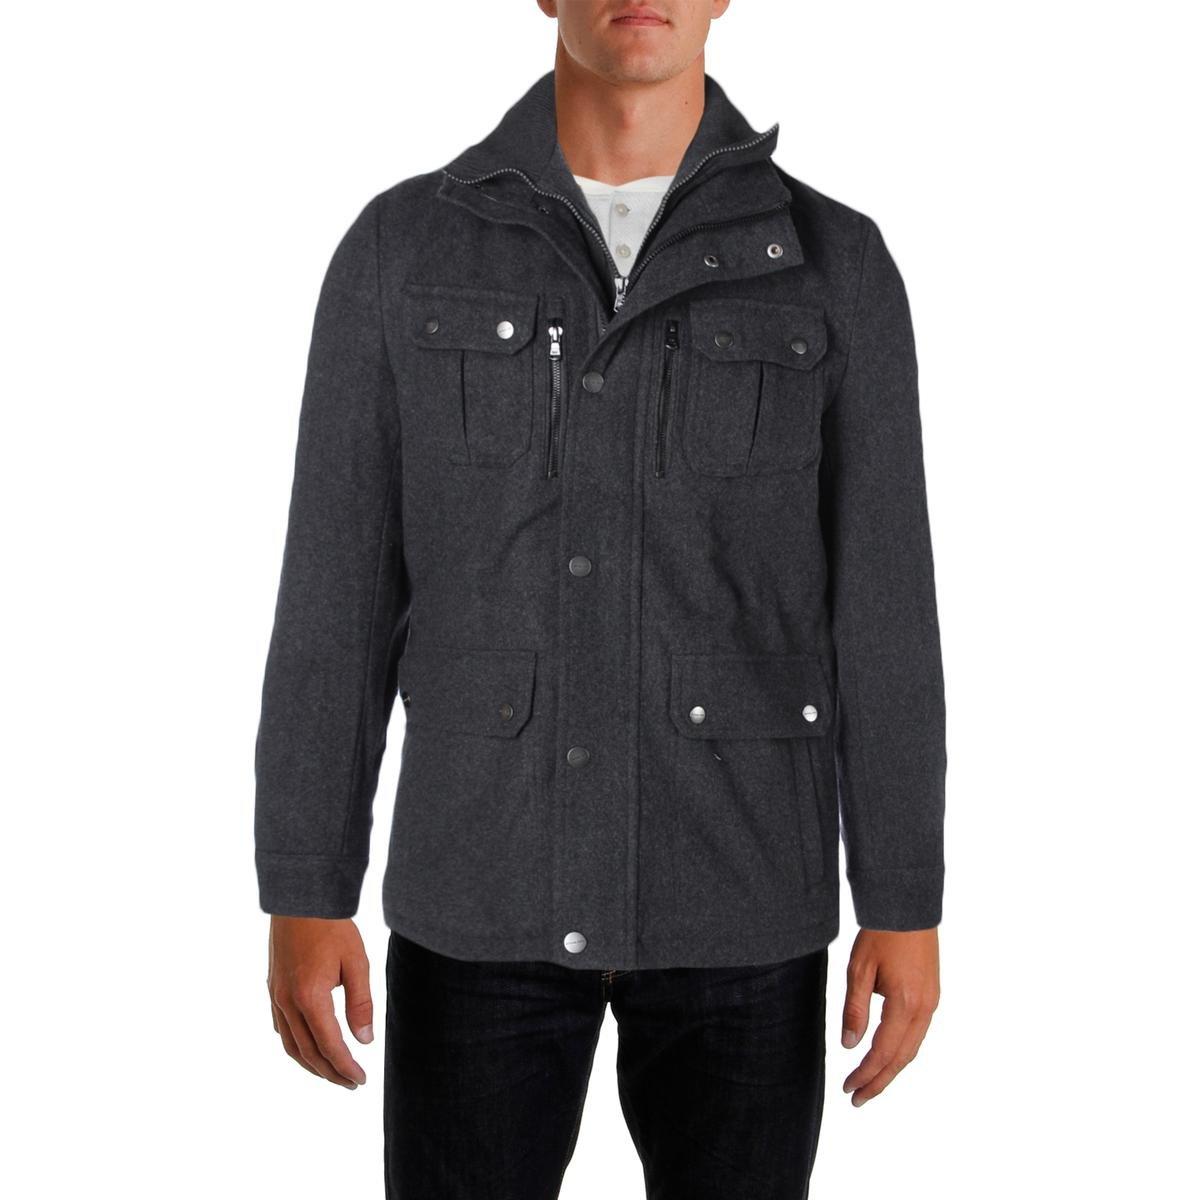 Michael Kors Mens Wool Attached Bib Field Coat Gray M by Michael Kors (Image #1)